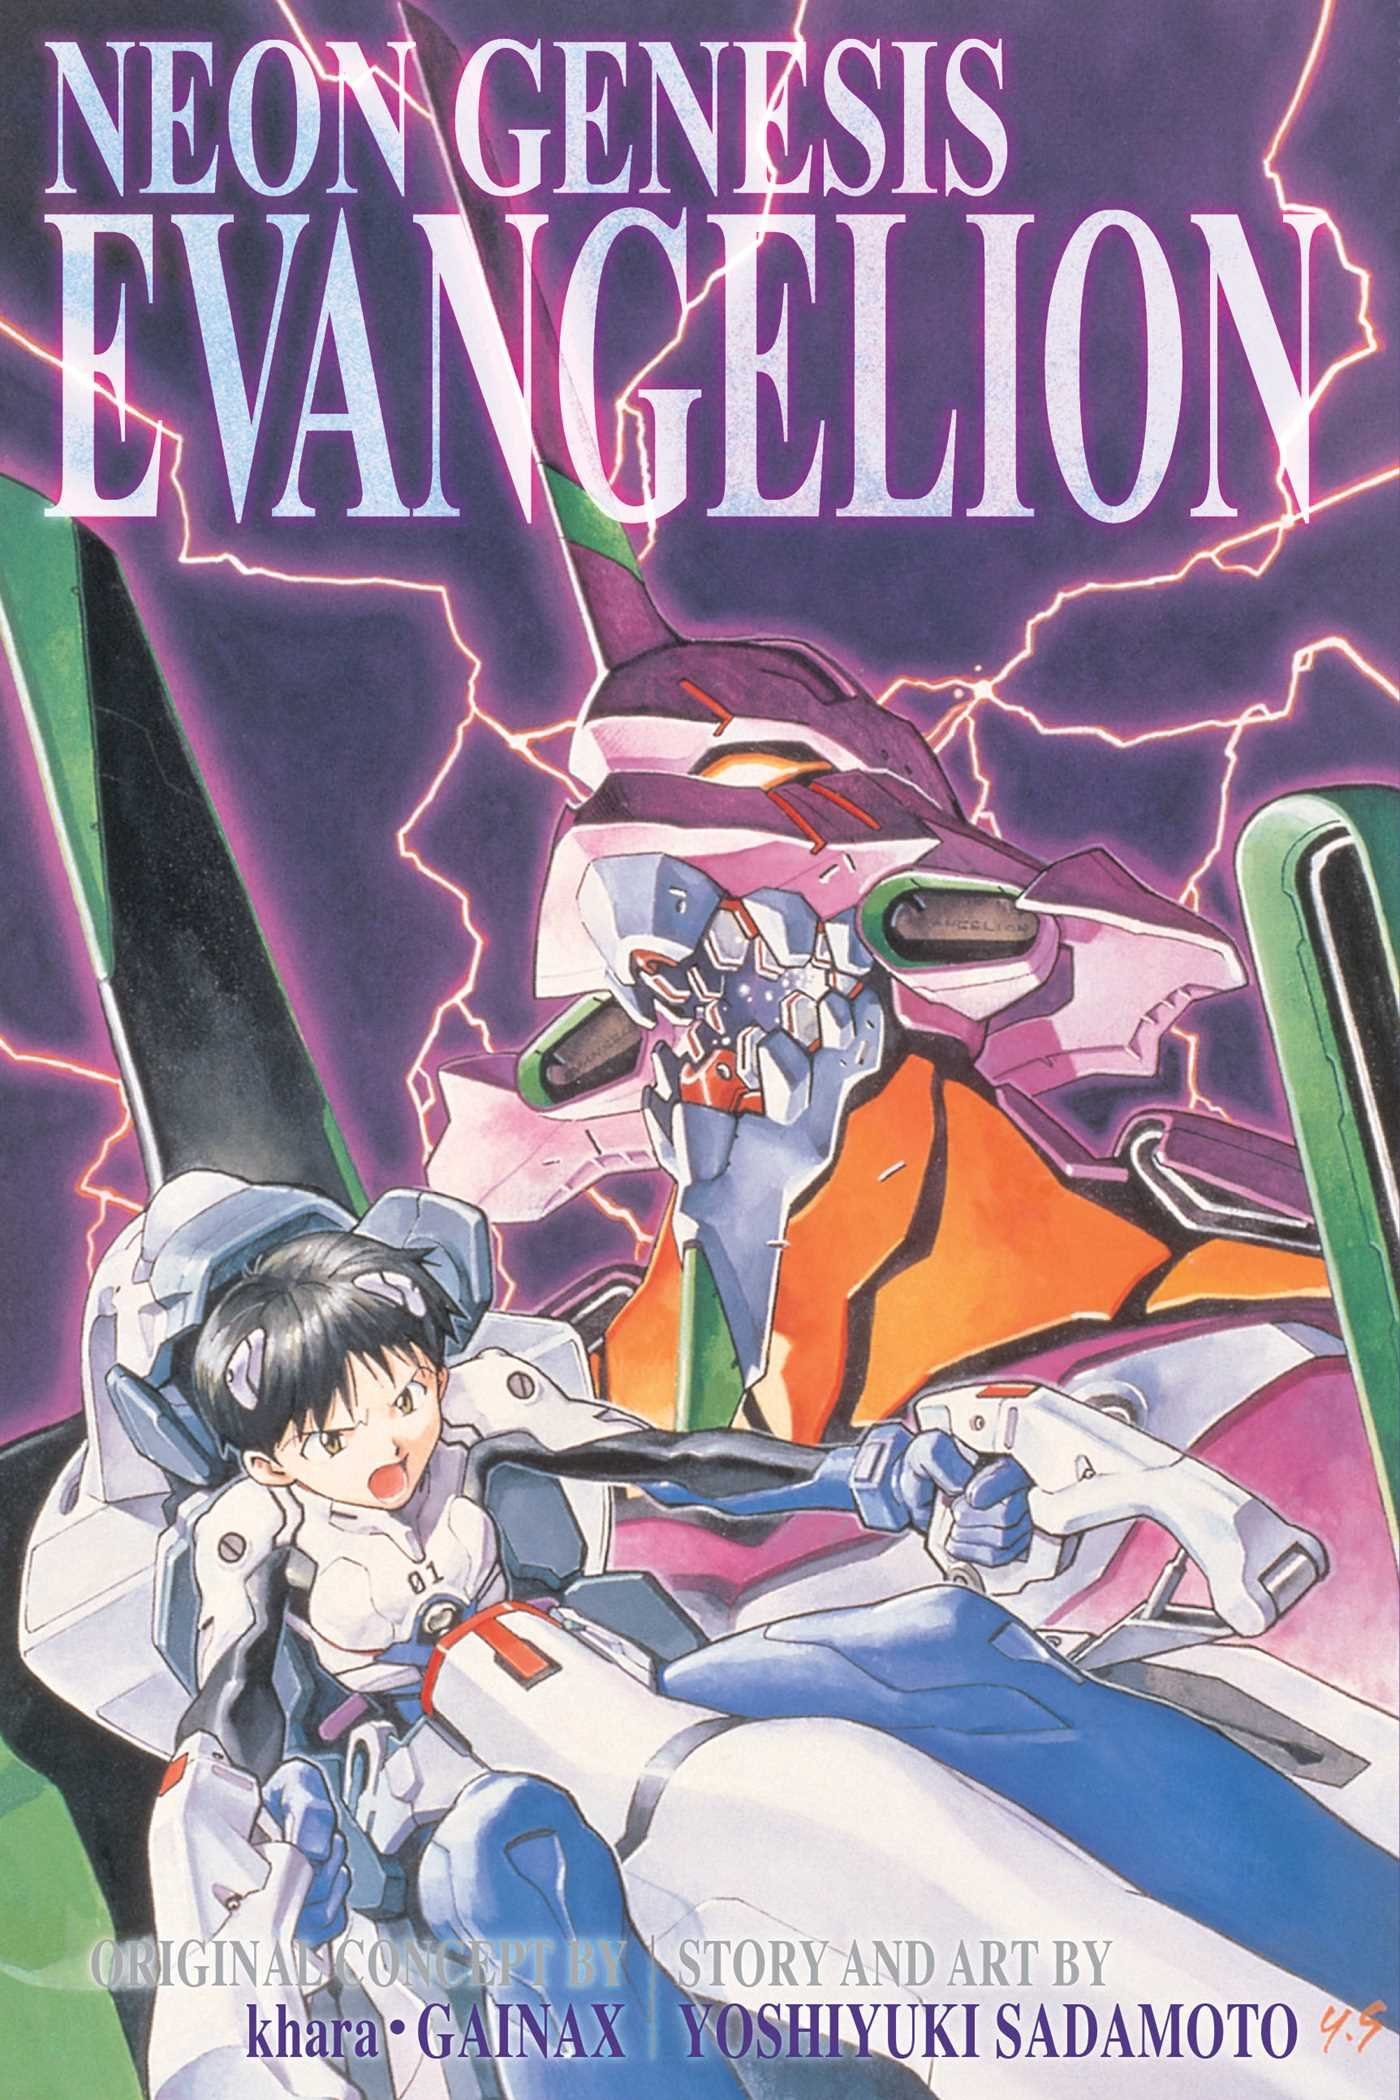 Neon Genesis Evangelion, Vol. 1 (2012, Viz Media)